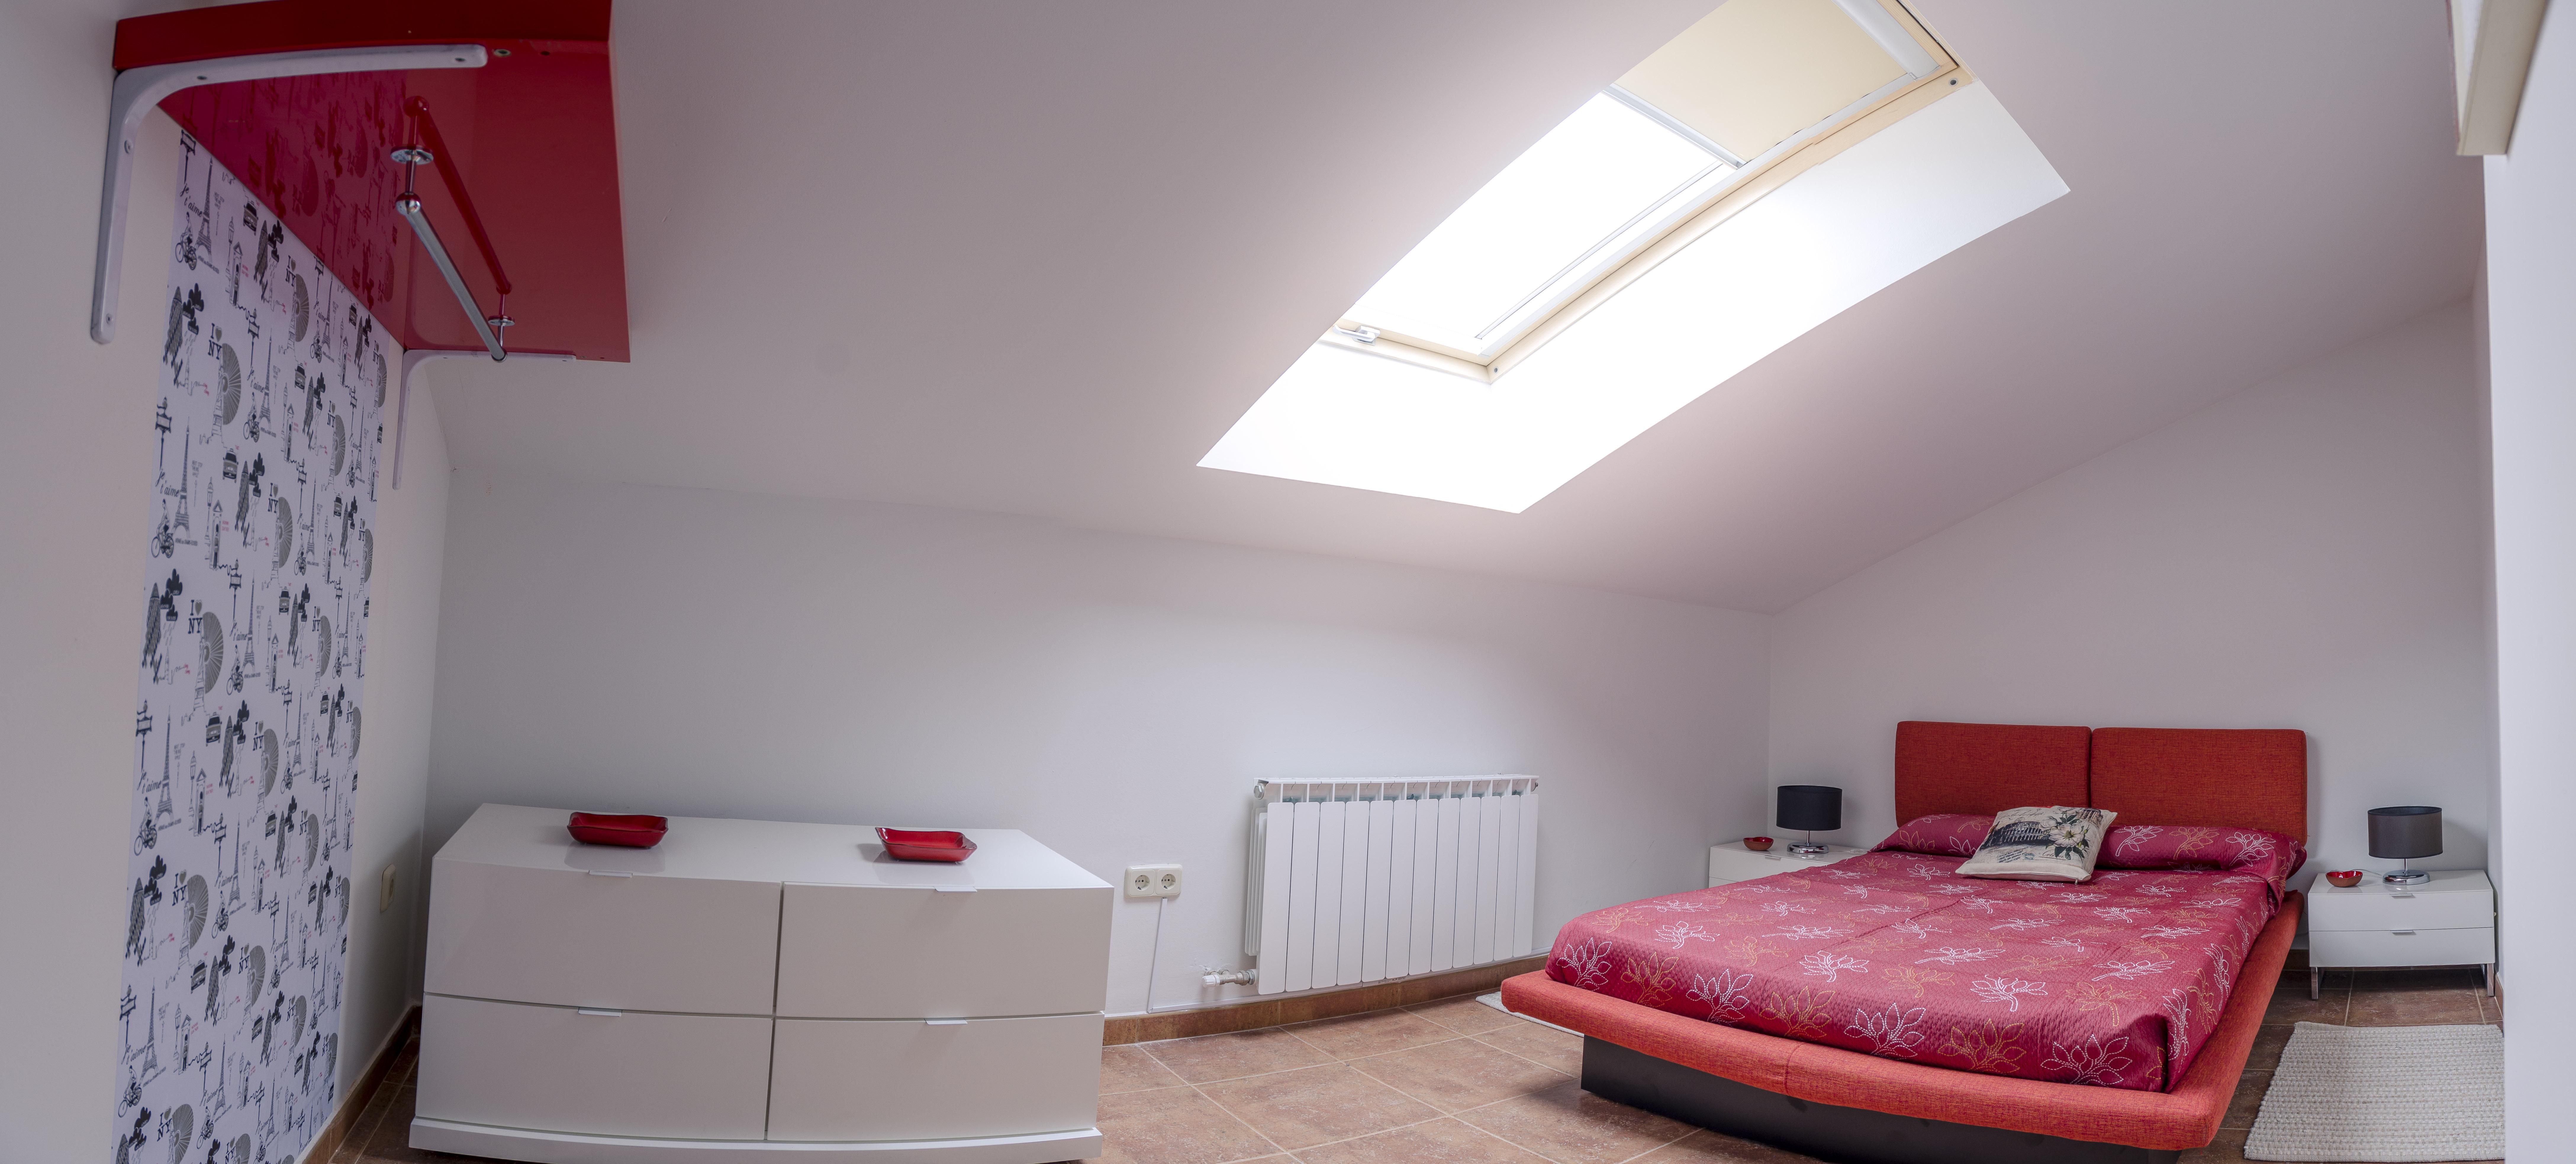 habitacion 6 bis.jpg